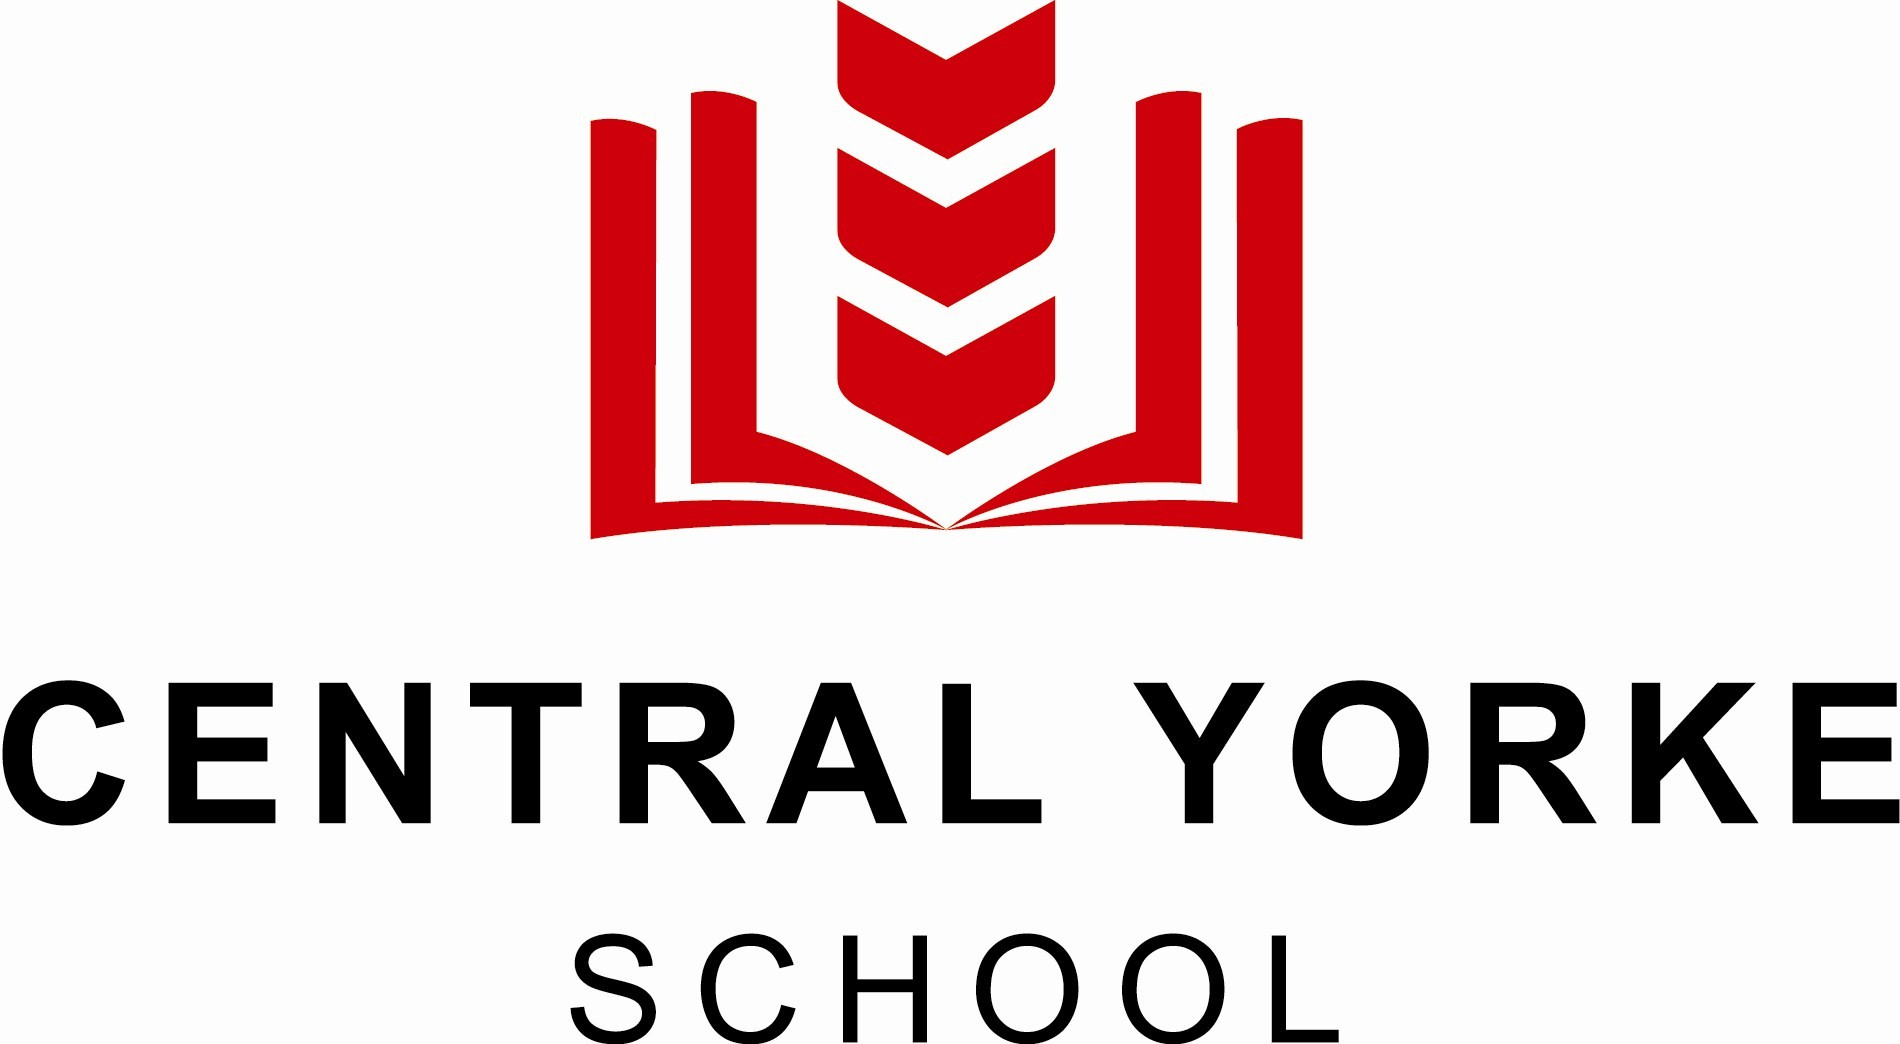 Central Yorke School